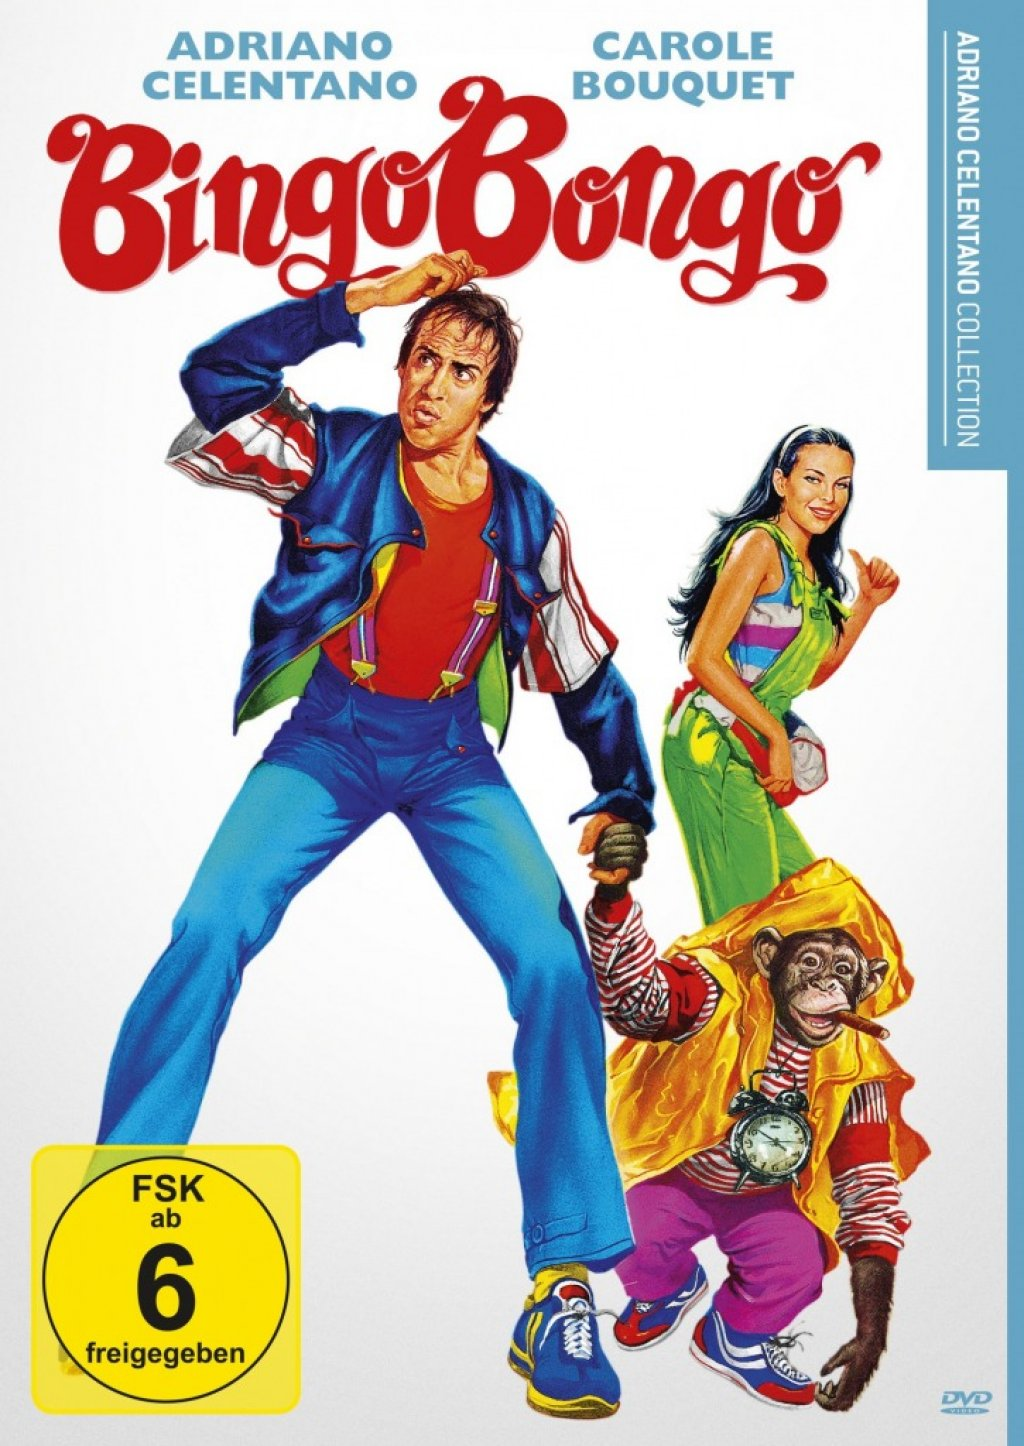 Bingo Bongo - Adriano Celentano Collection (DVD)